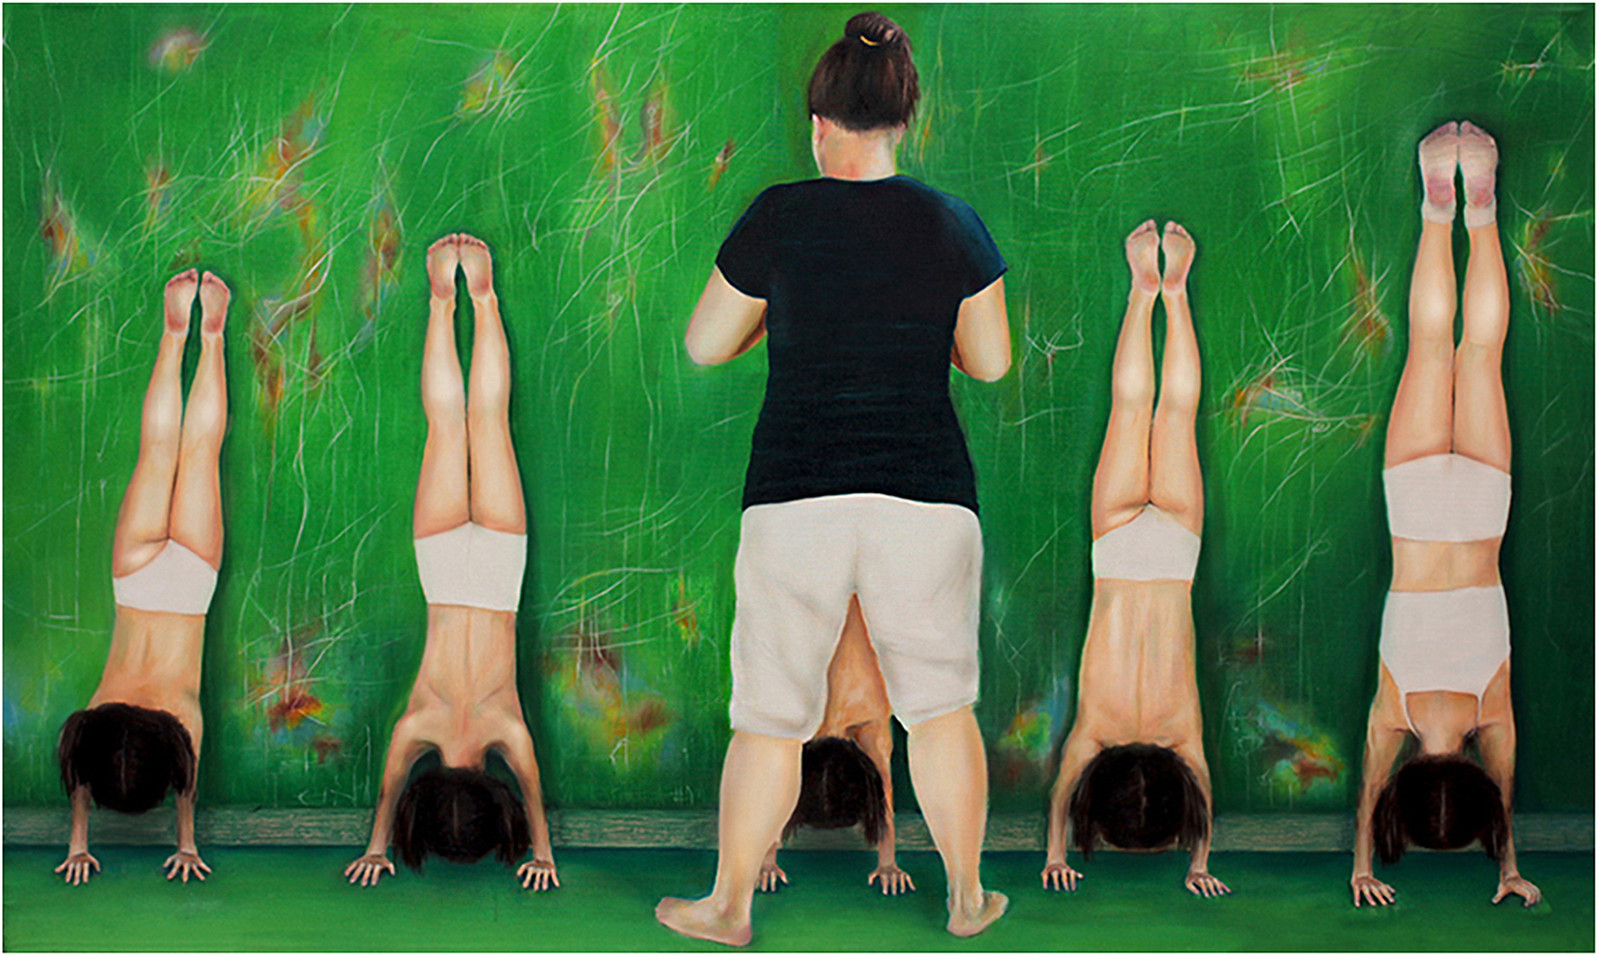 Synchronized handstand